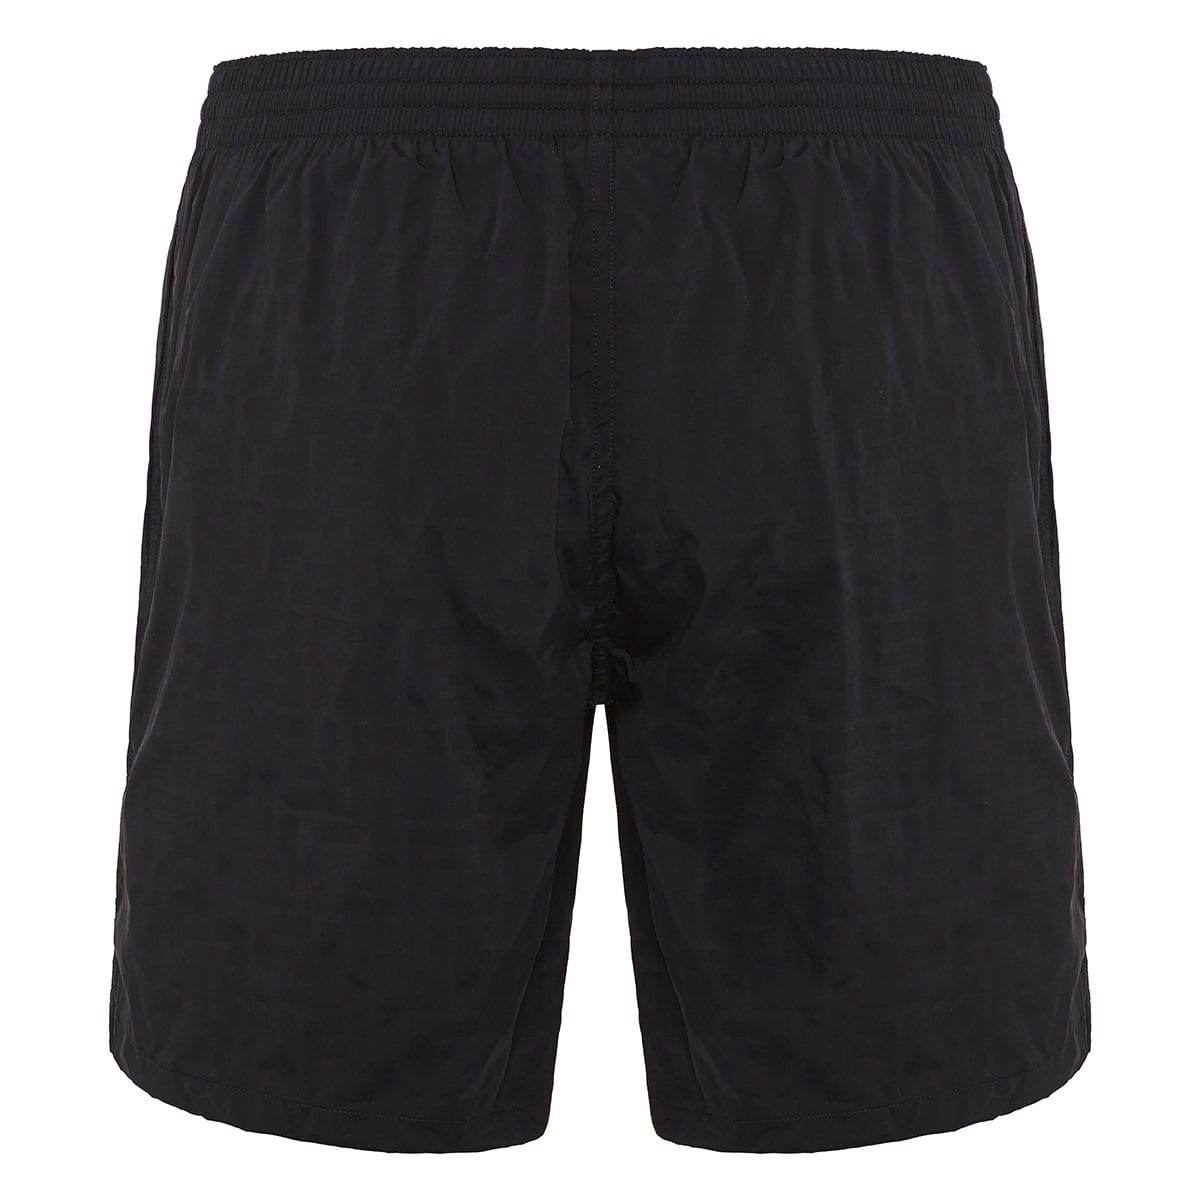 FF swim shorts